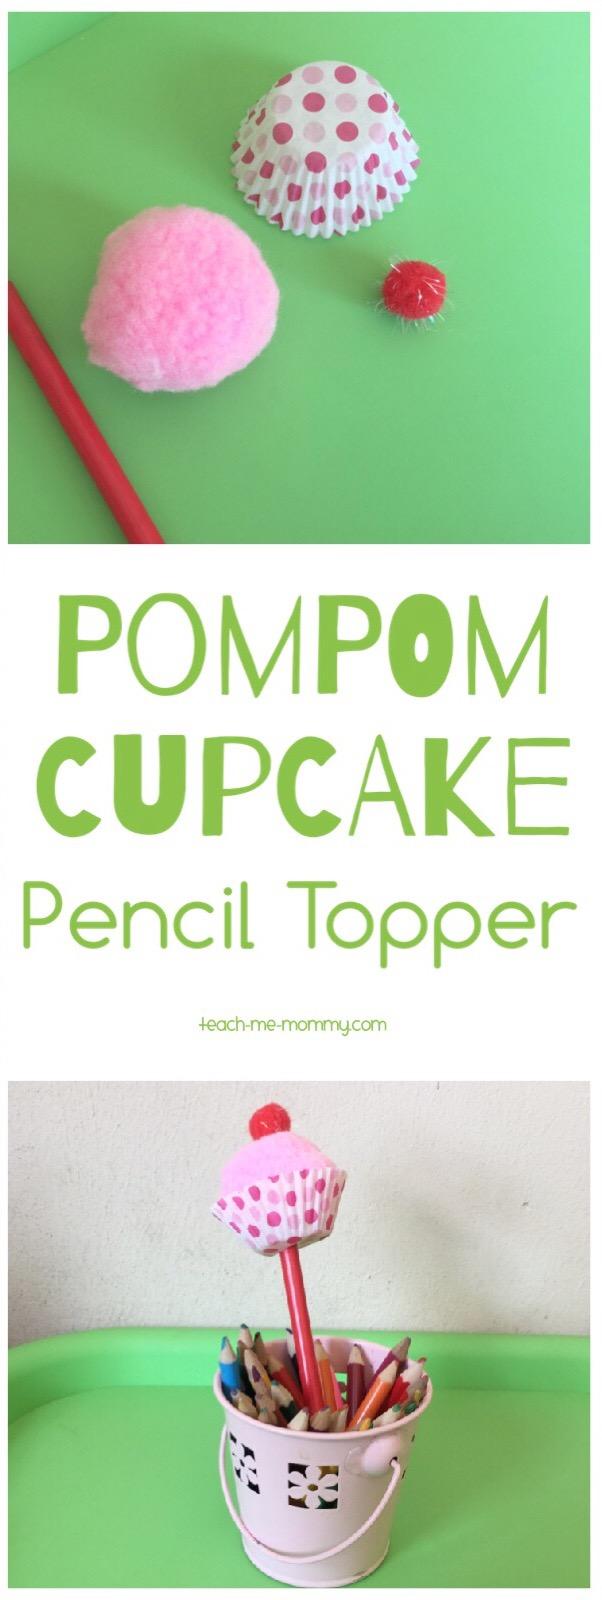 pompom pencil topper